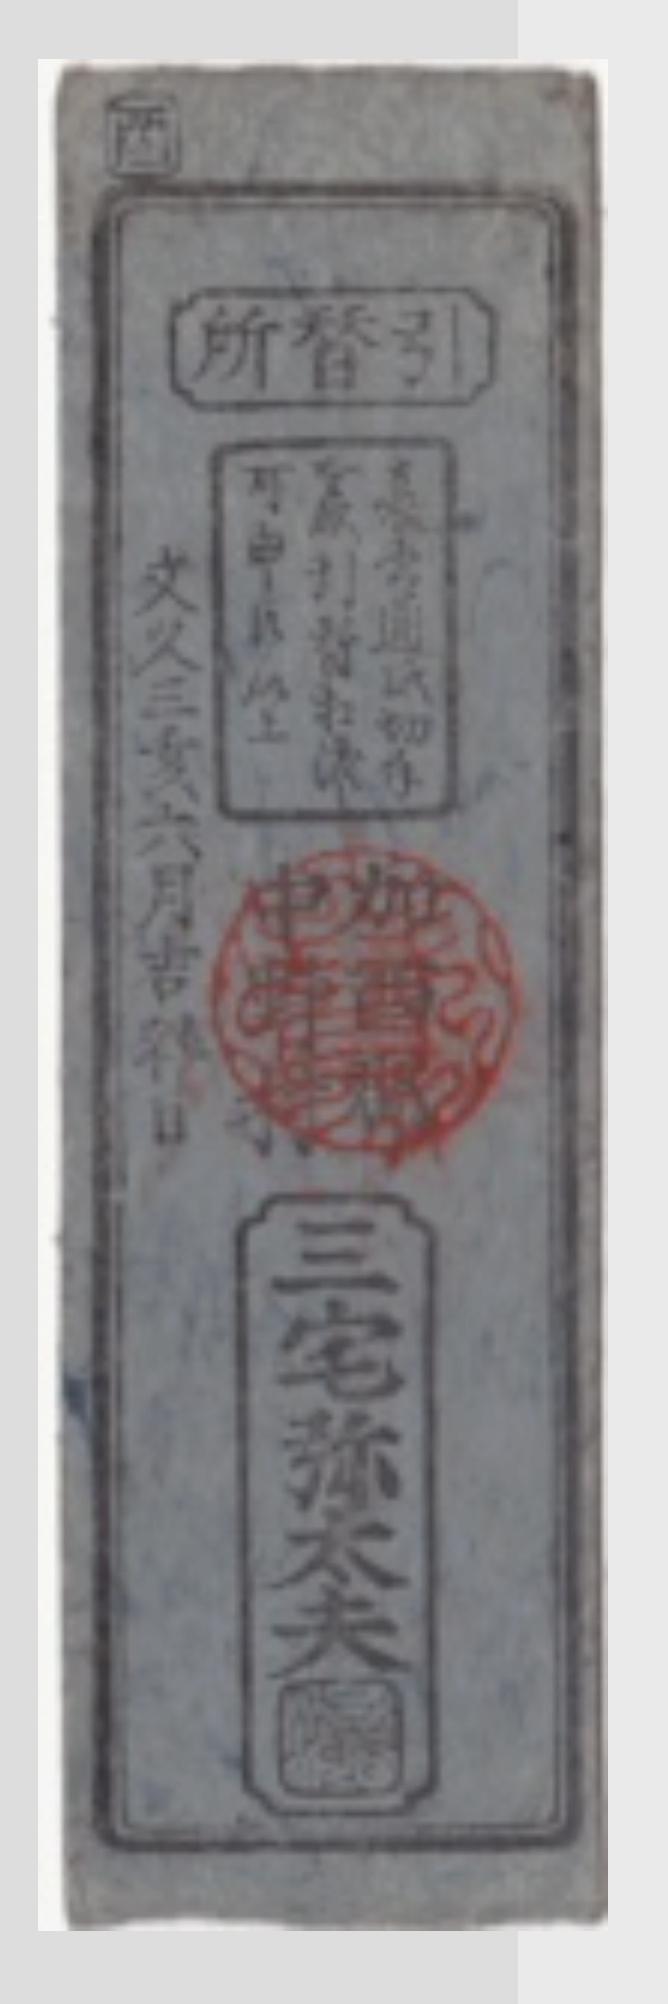 1 Hansatsu - 1 Monme de Plata Japón - 1863 Captur10